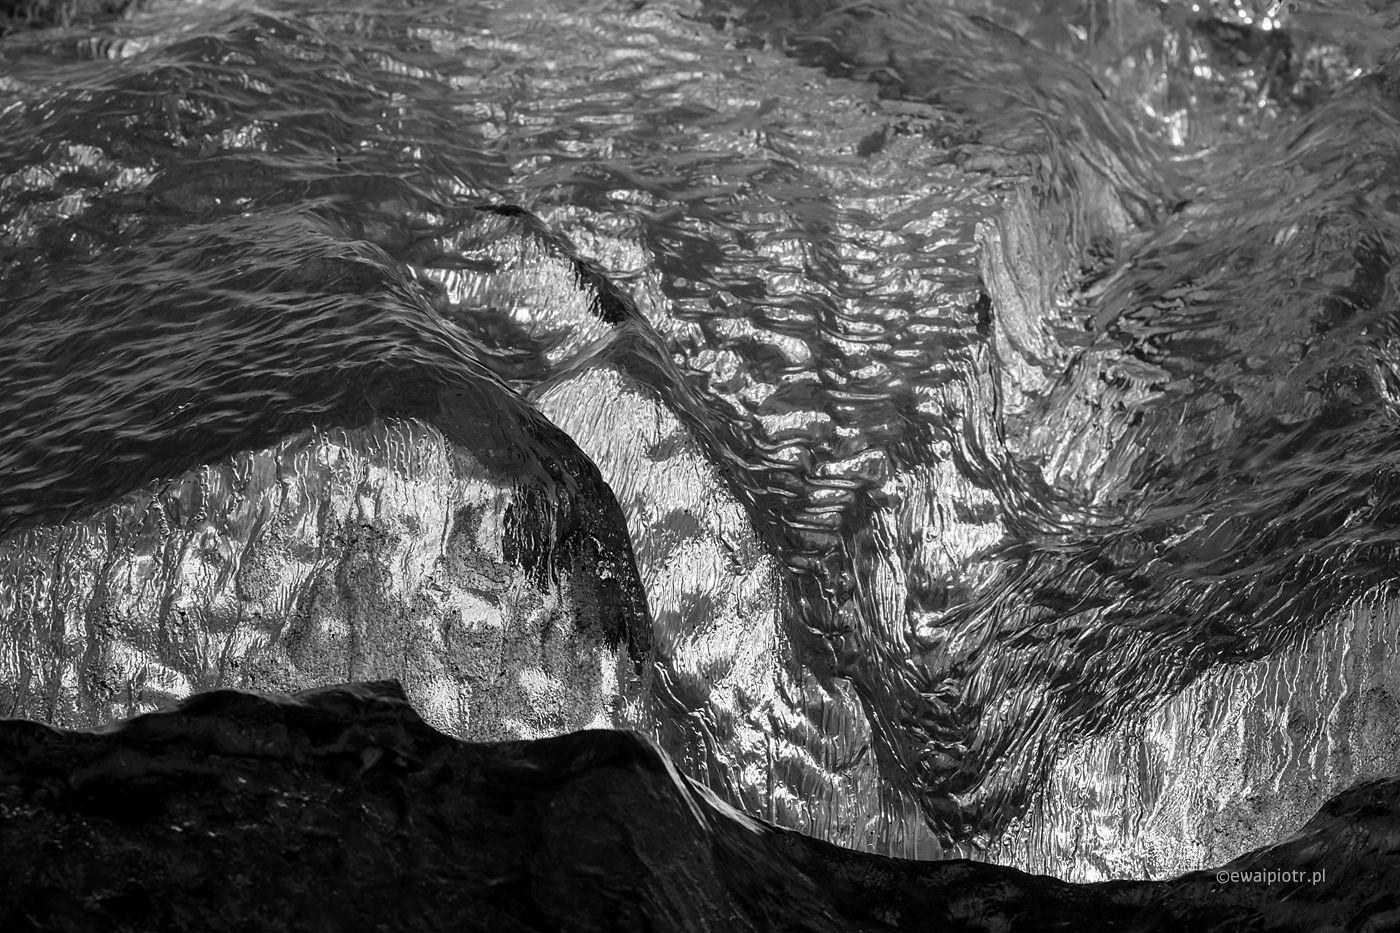 Lód z Jokulsarlon, Islandia, fotografia czarno-biała